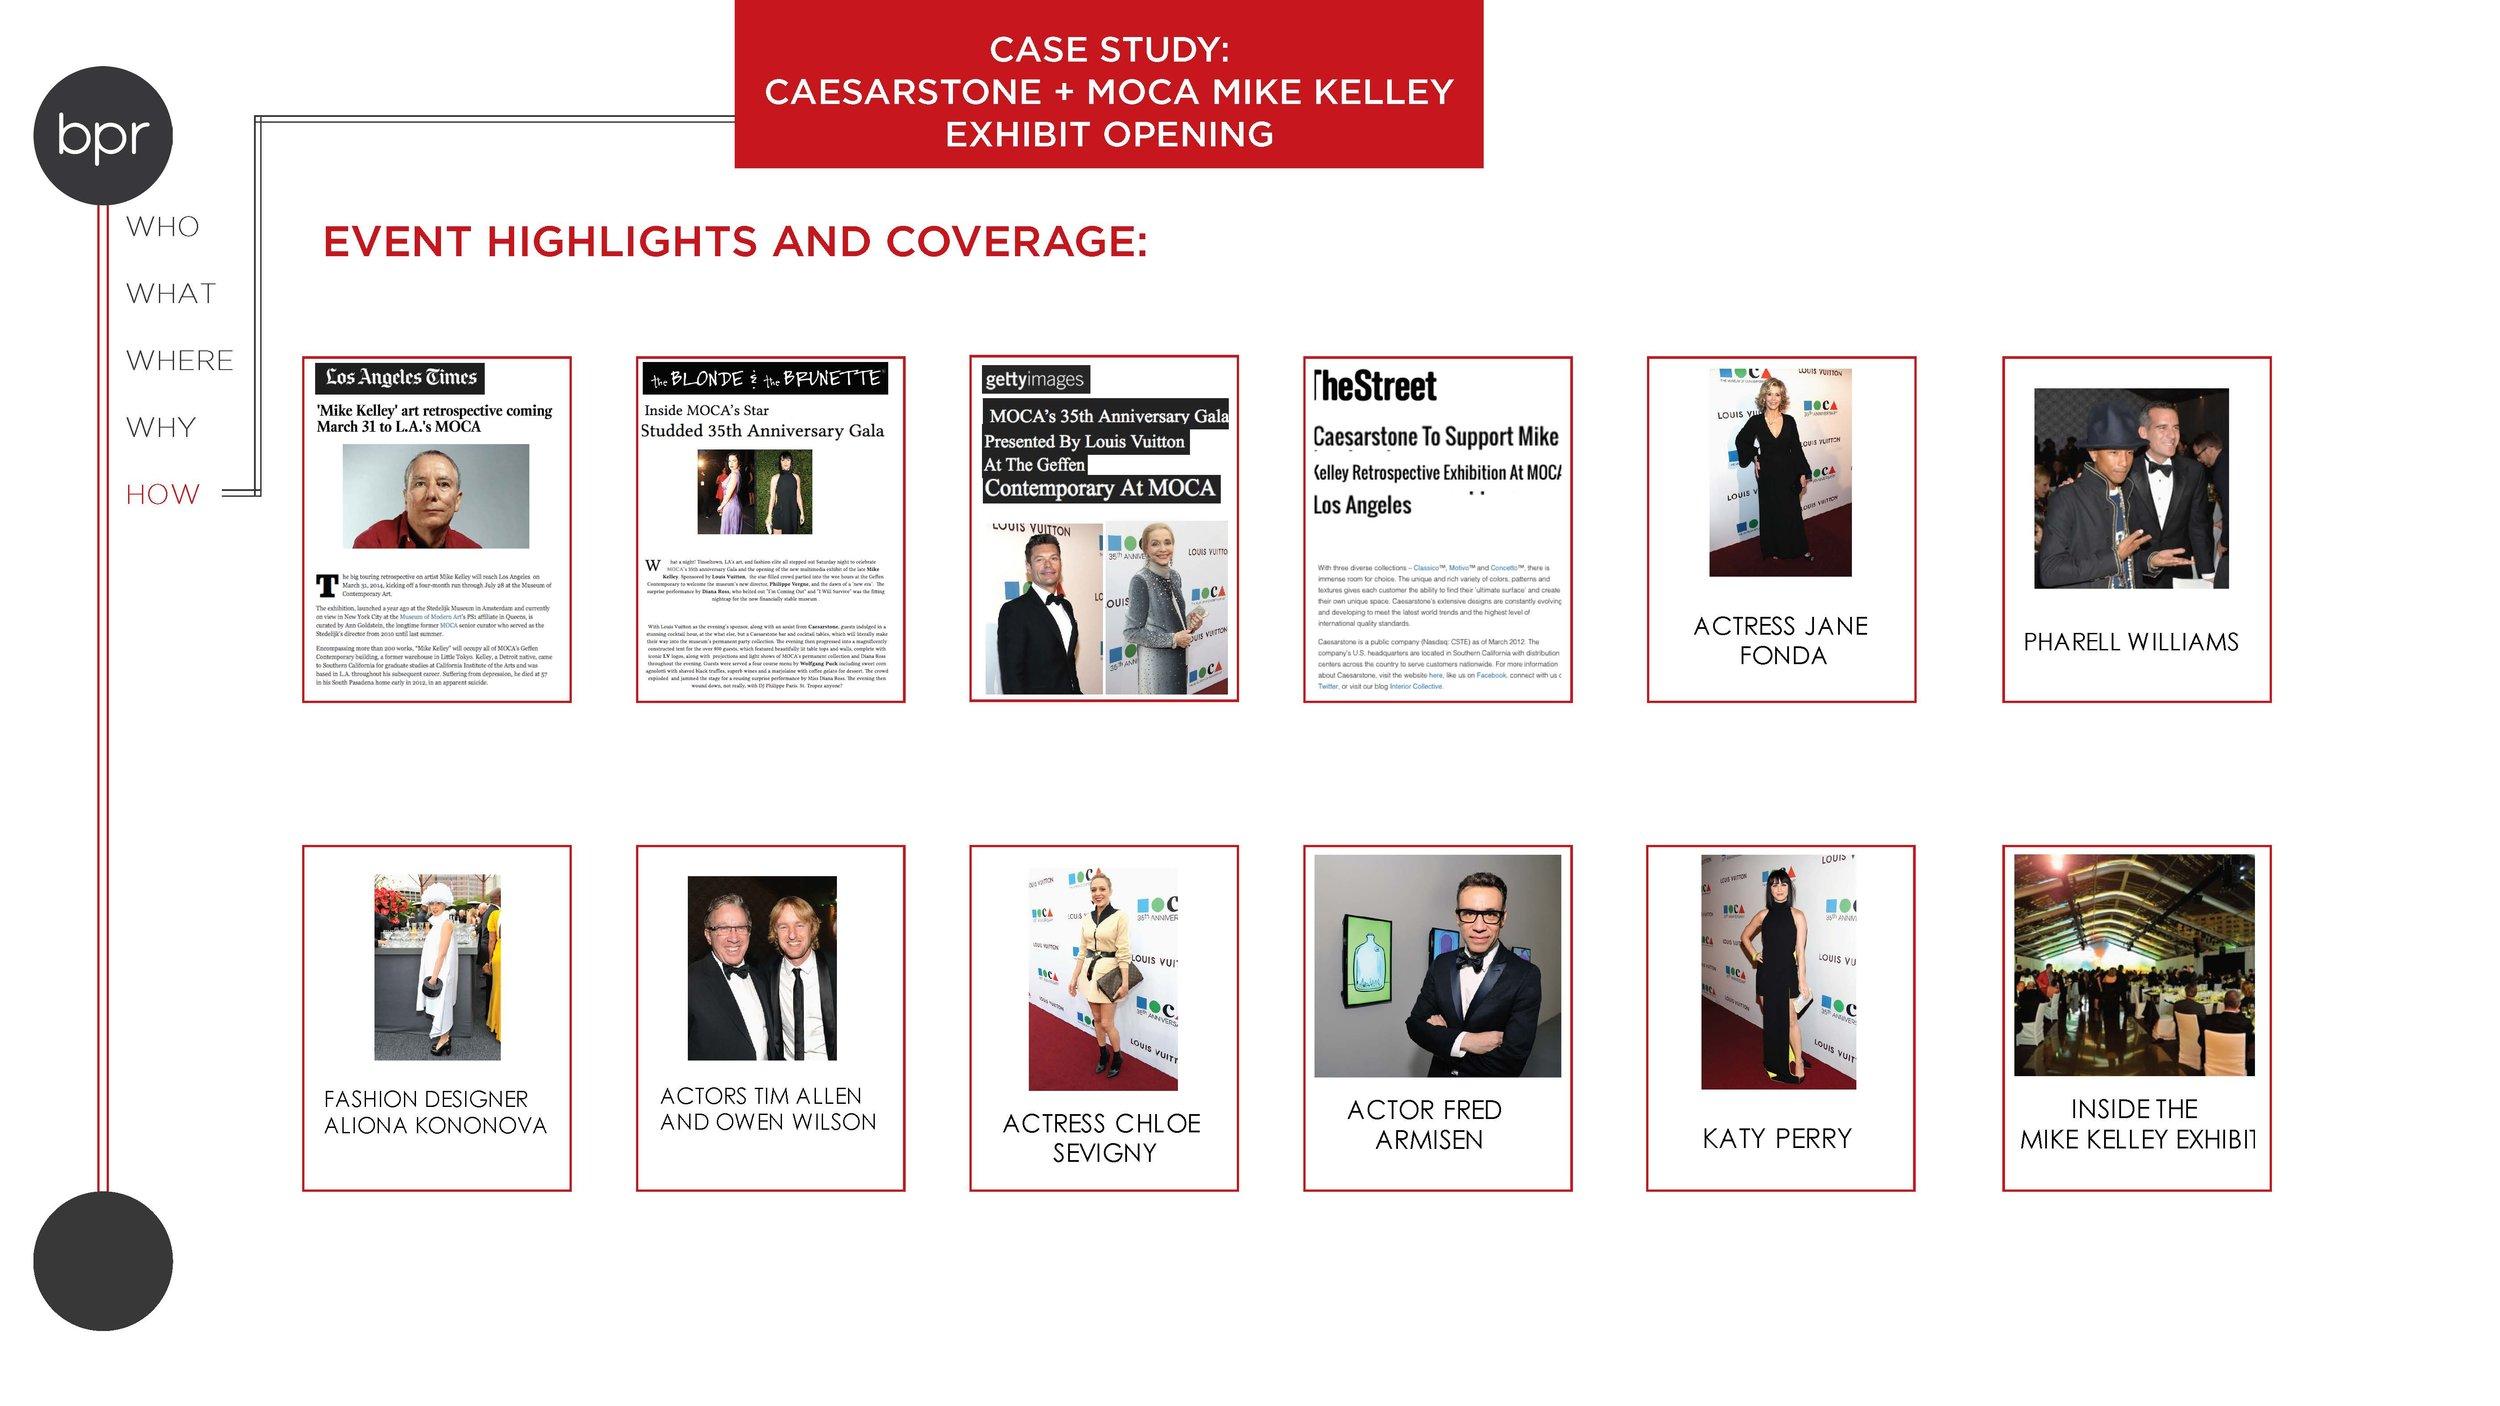 Caesarstone+MOCA Case Study_Page_4.jpg